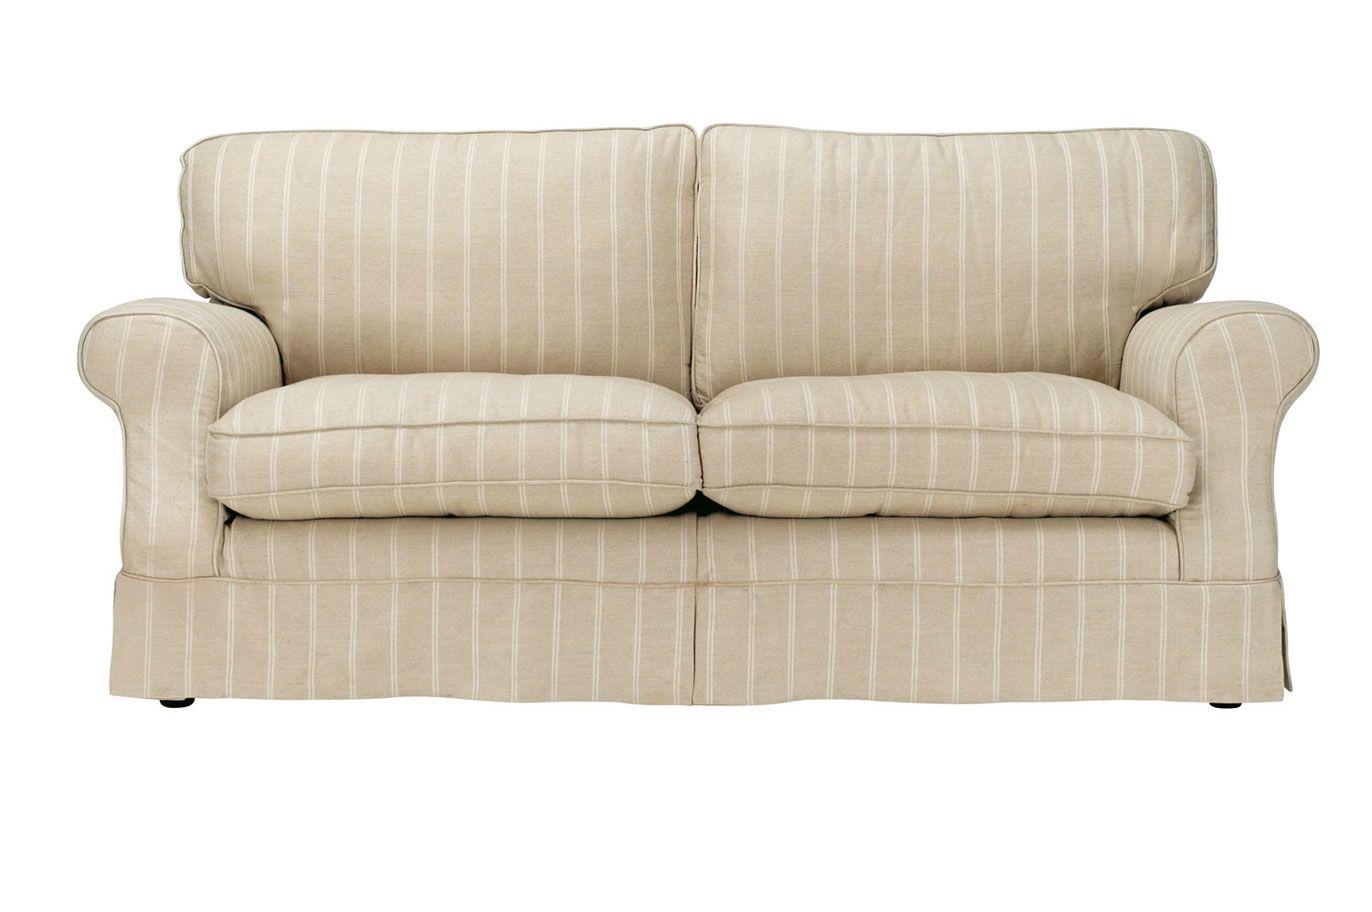 padstow 2 seater sofa laura ashley stealasofa promo code brokeasshome